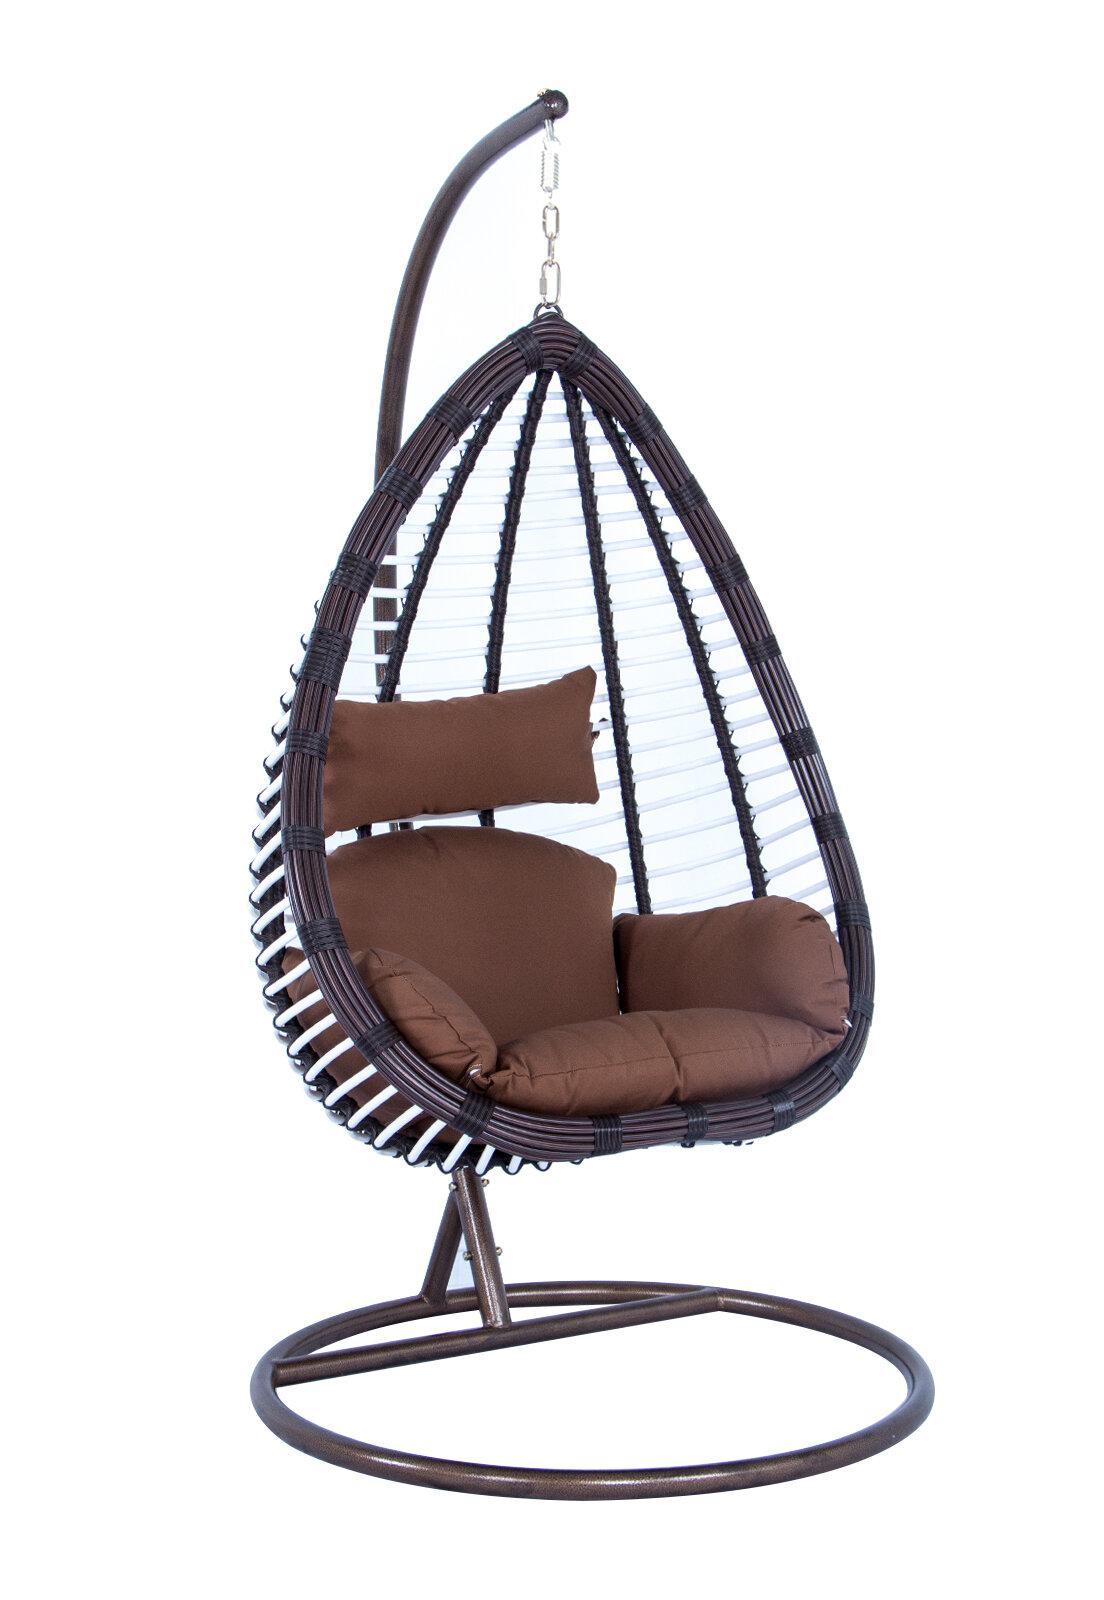 Bayou Breeze Schumacher Wicker Hanging Egg Swing Chair With Stand Wayfair